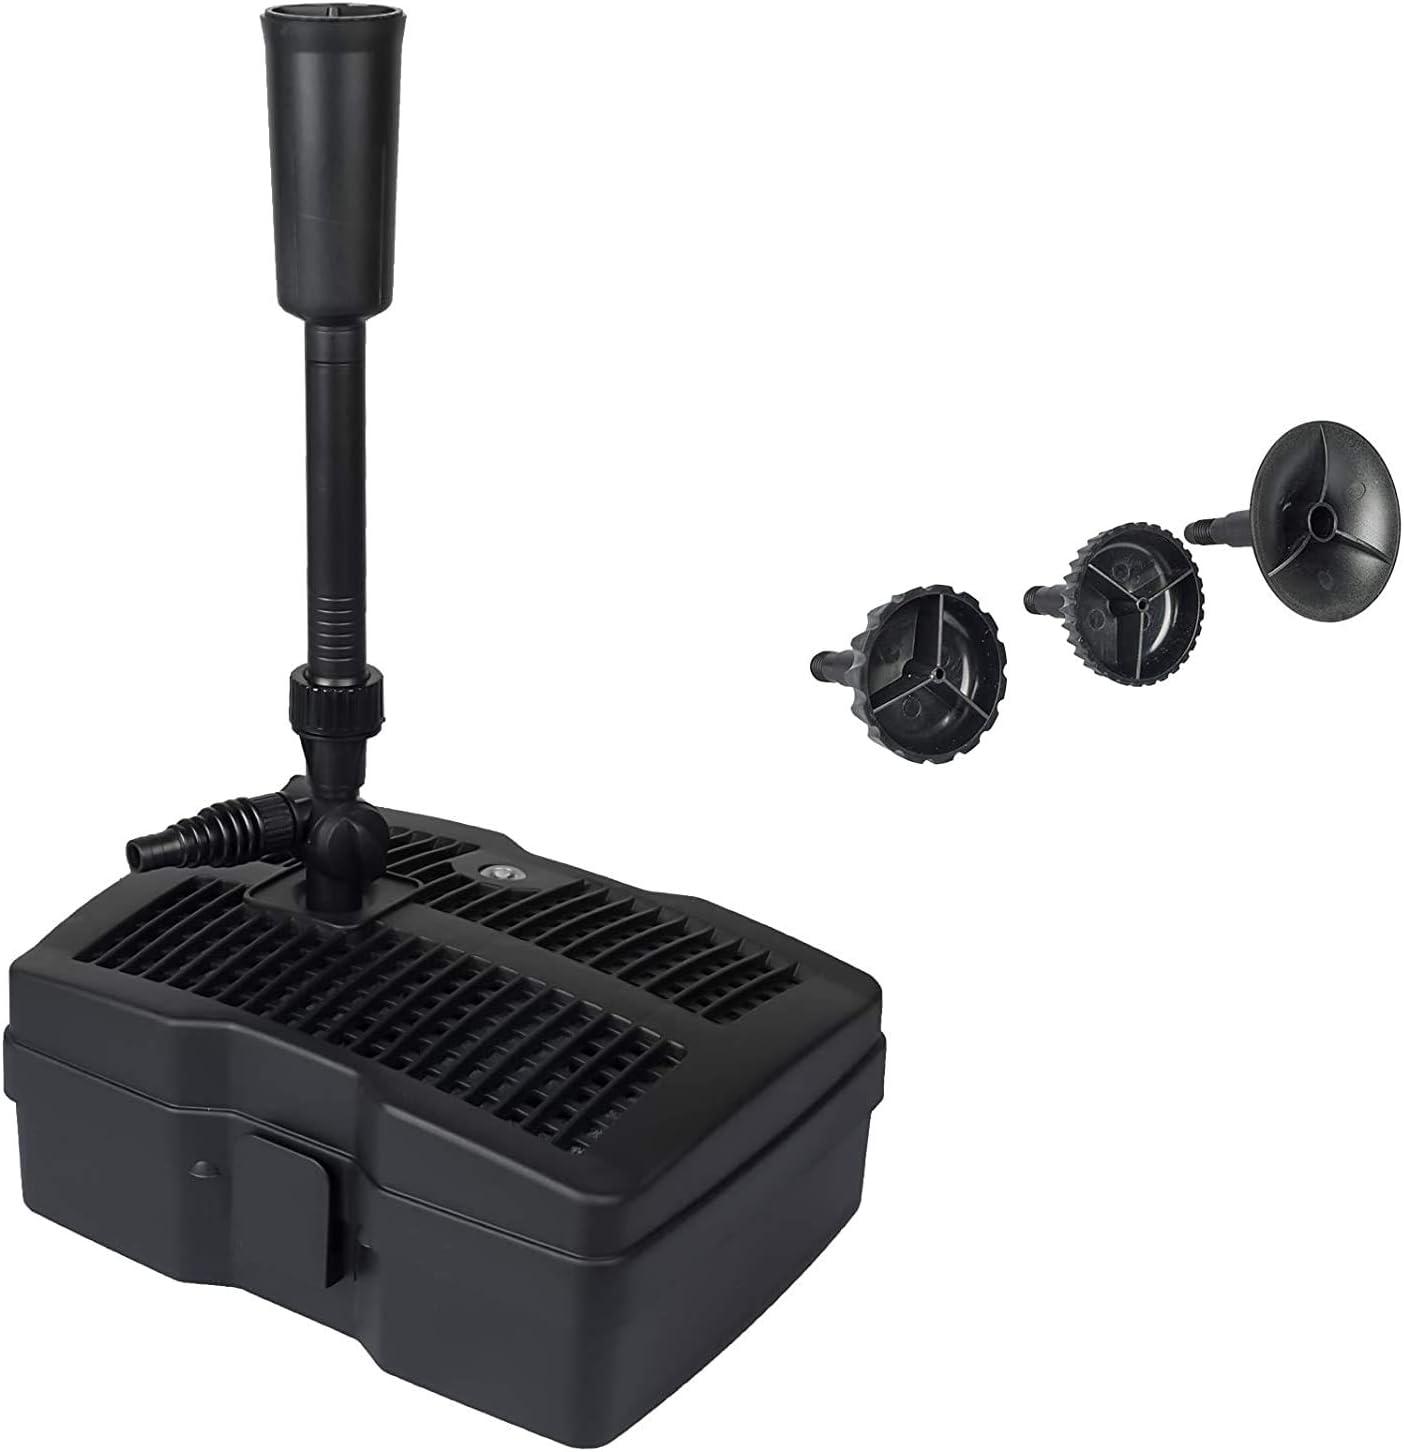 GRECH CUF-2511 11W Pond Pump Heads Black Over item handling ☆ Fountain 396gph w Be super welcome